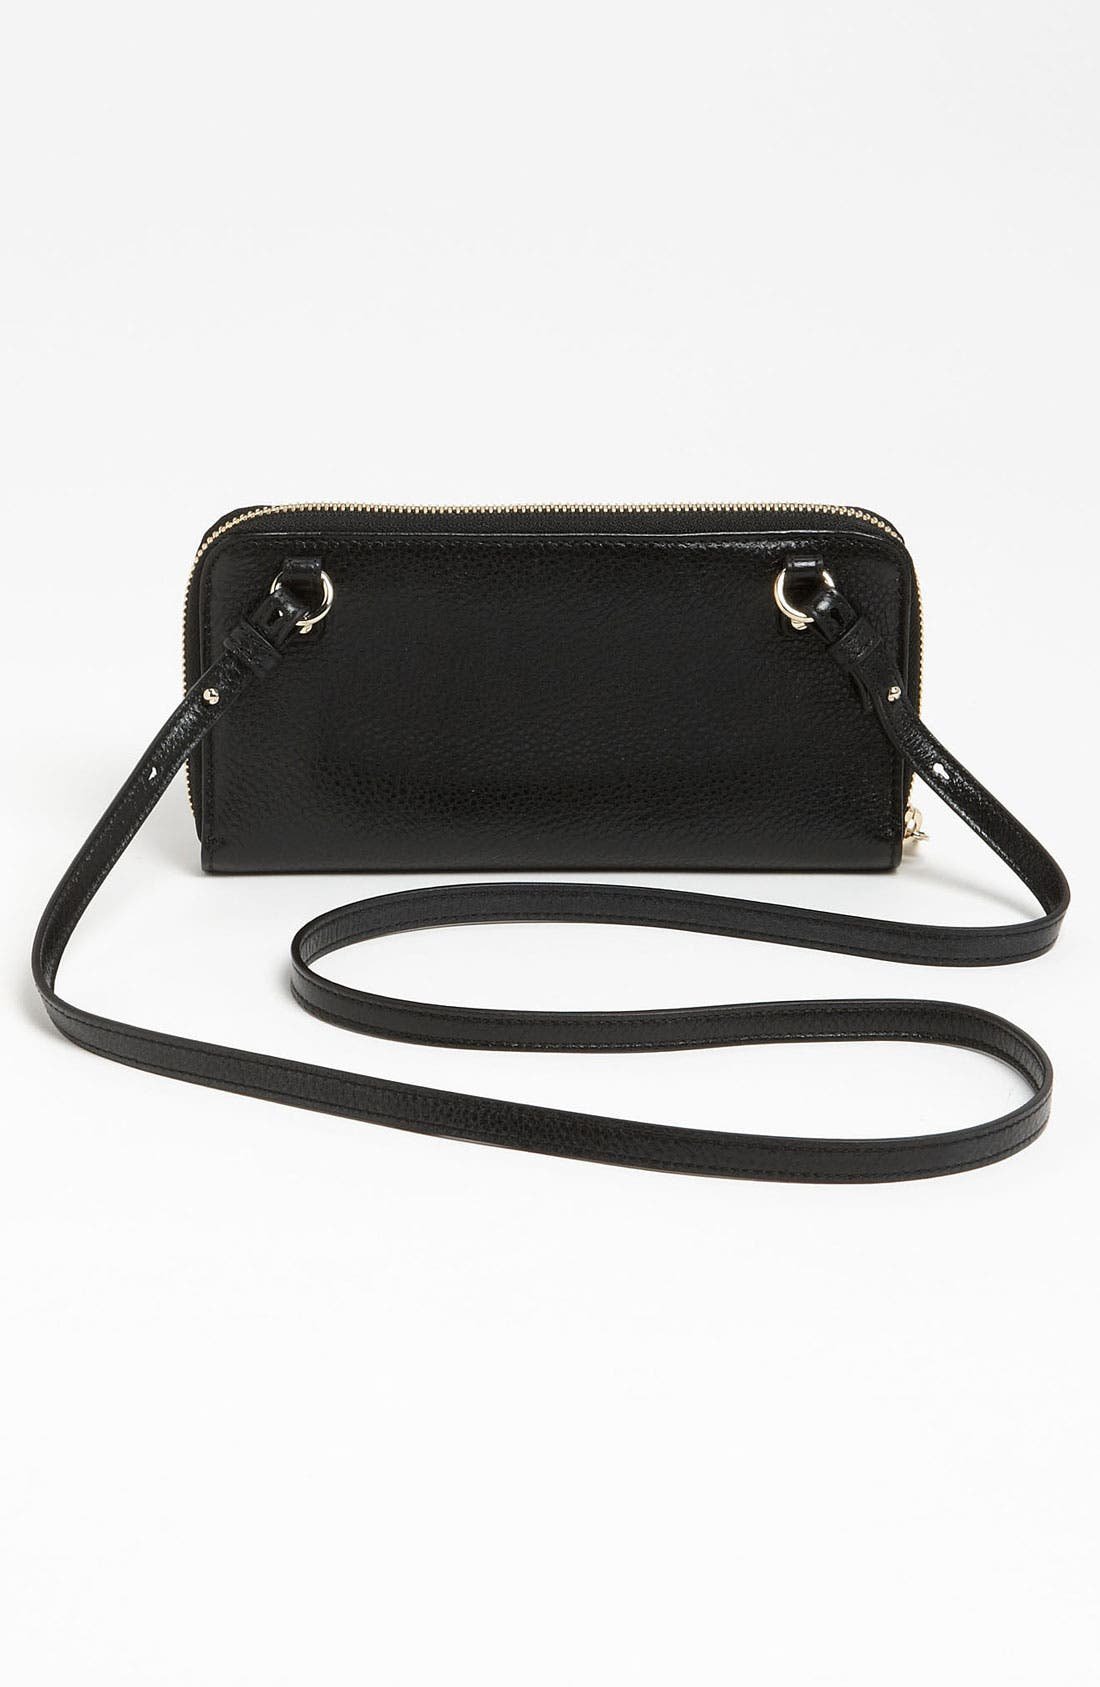 Alternate Image 4  - Chloé 'Lily - Long' Sunglasses Case & Crossbody Wallet